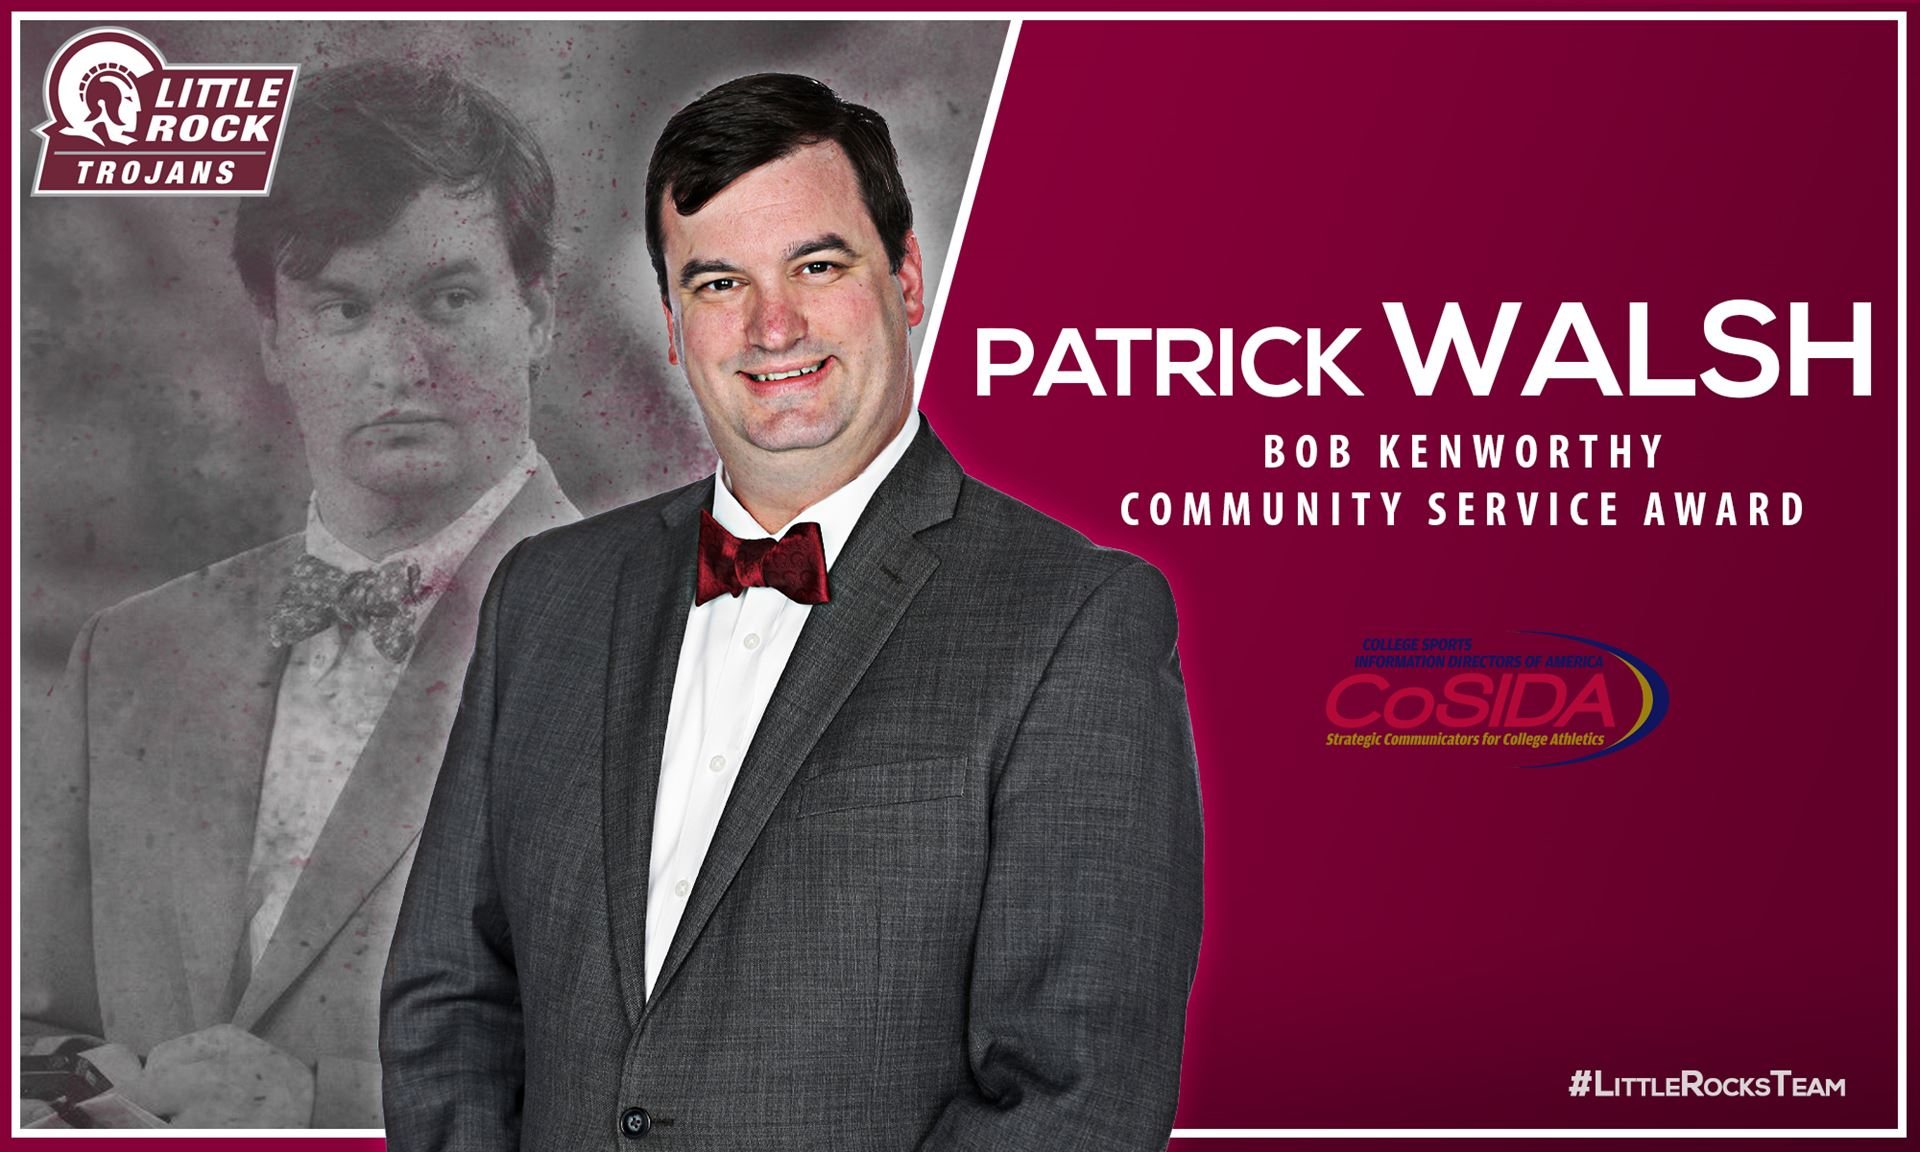 Little Rock Trojans Associate Director of Communications Patrick Walsh